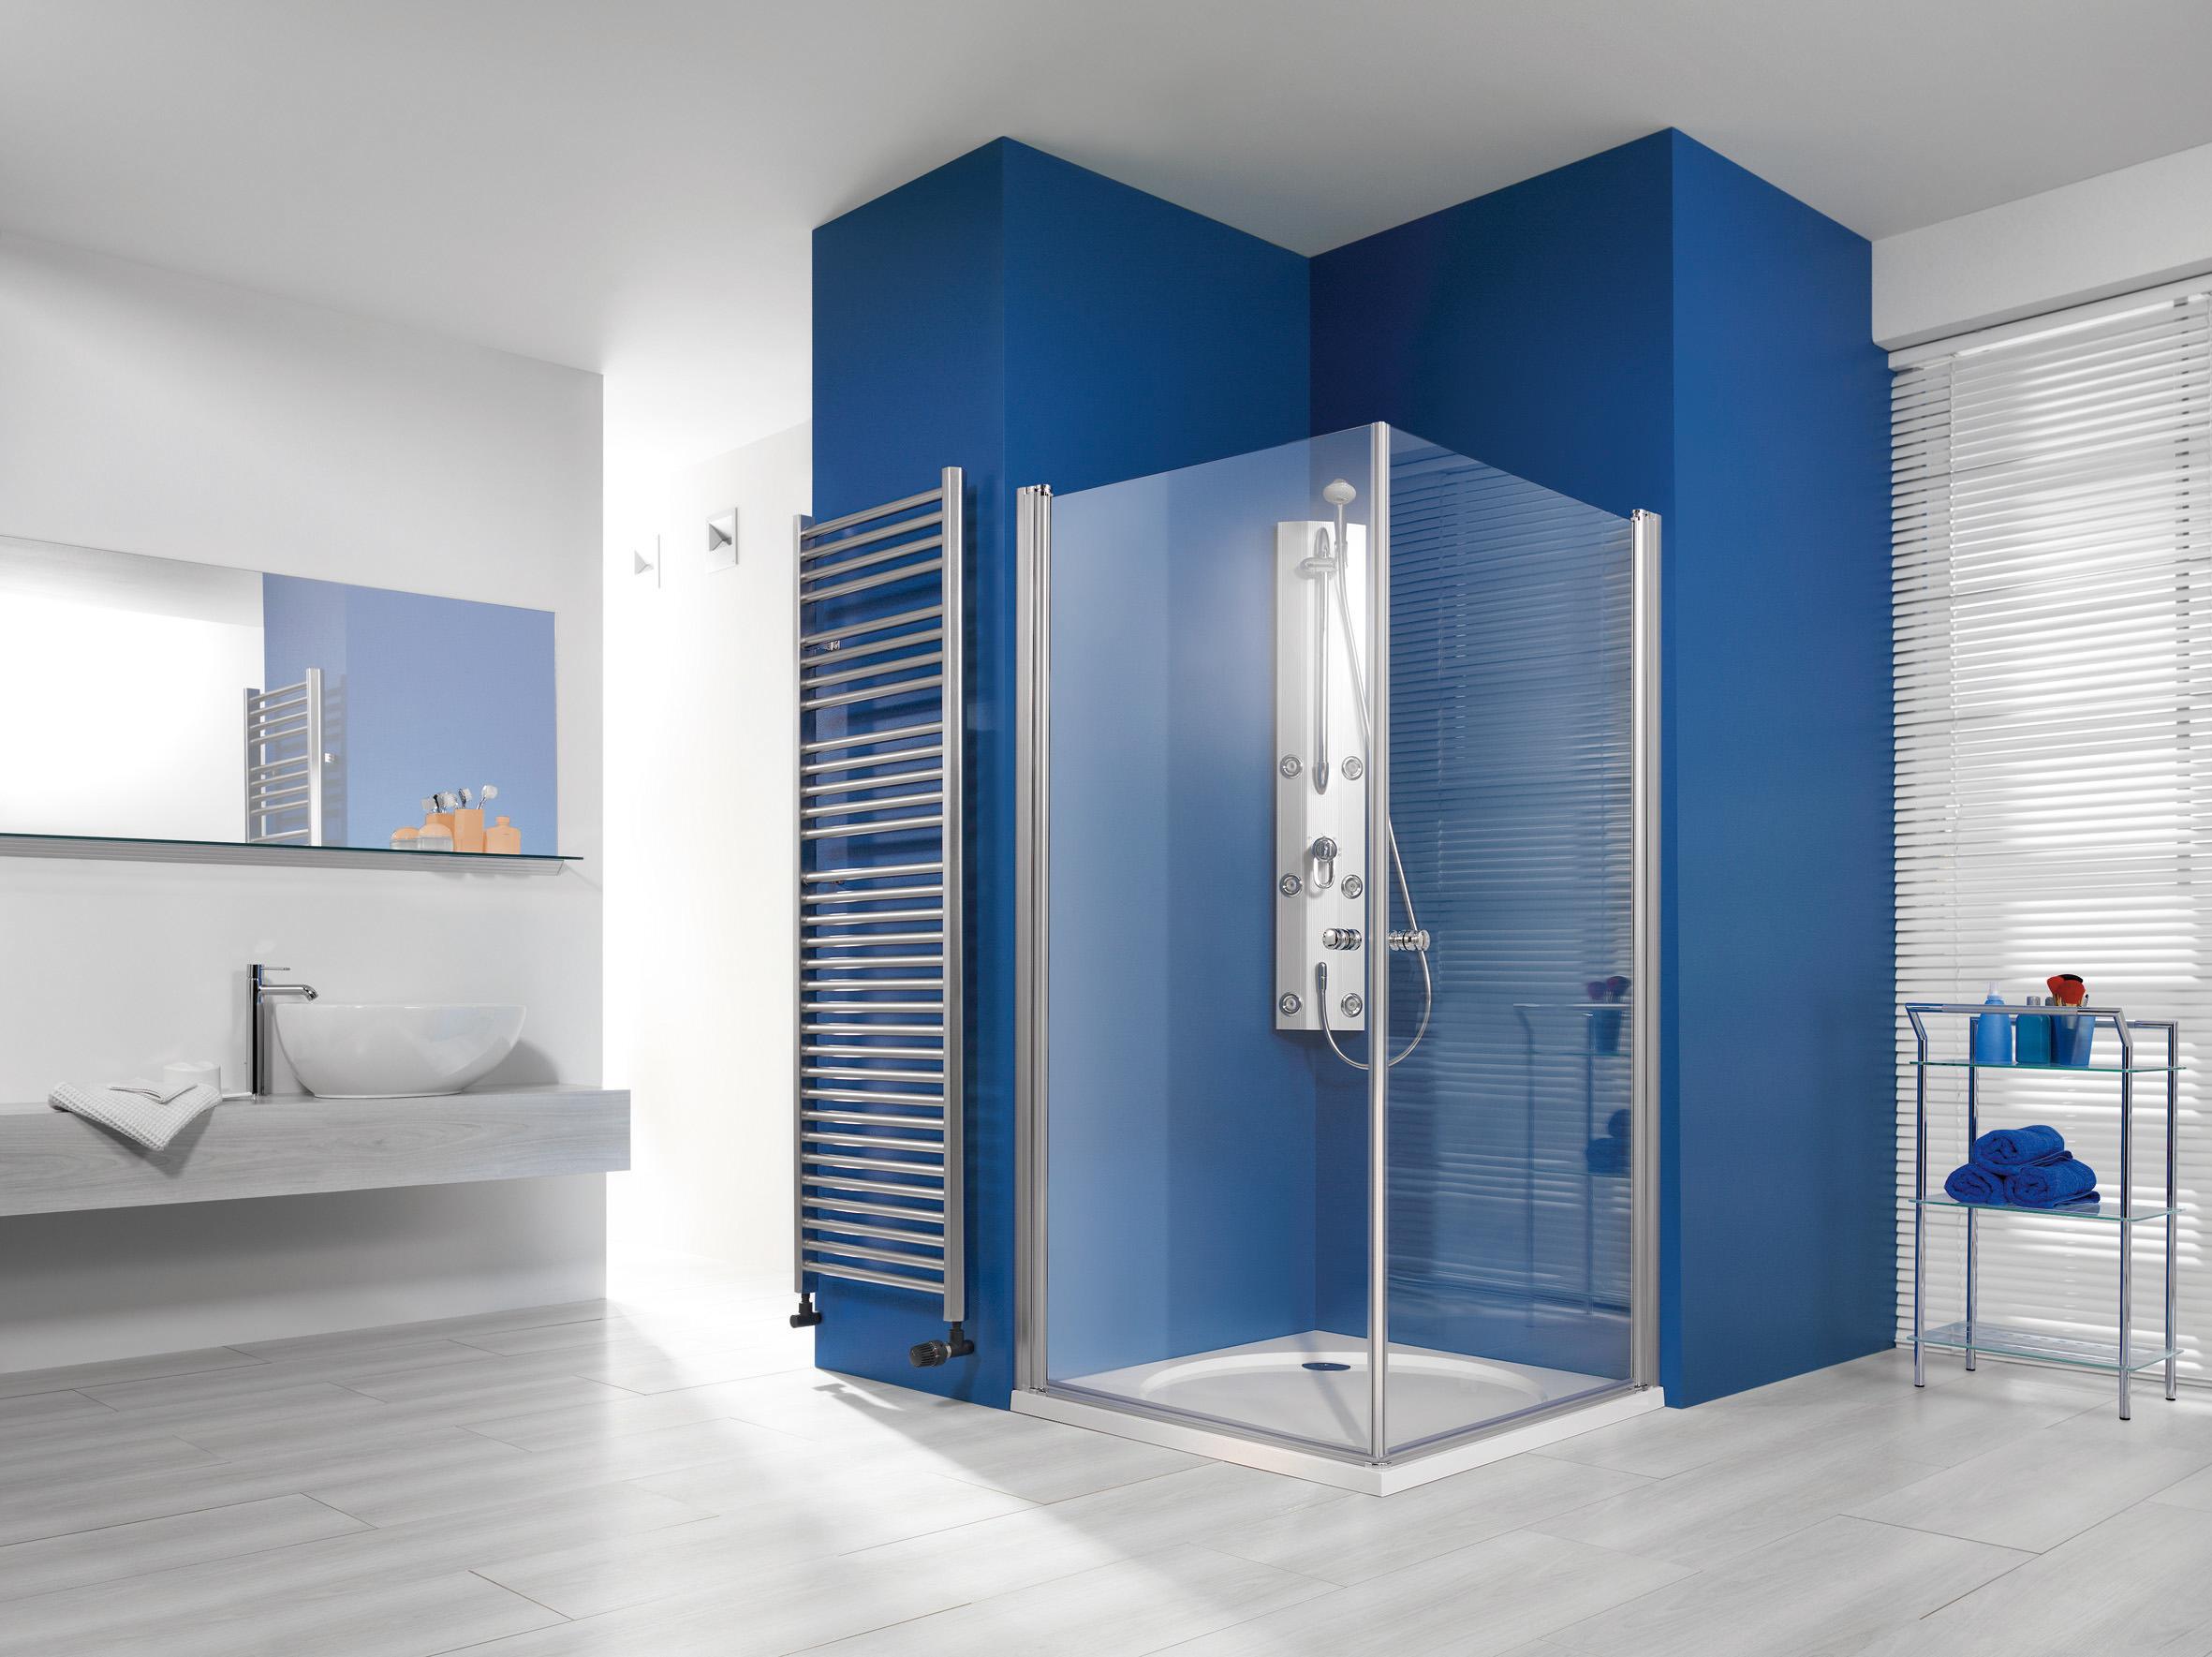 breuer elana eckeinstieg 2 teilig klarglas hell alu silber matt 75cm x 75cm 200cm 0607 001. Black Bedroom Furniture Sets. Home Design Ideas